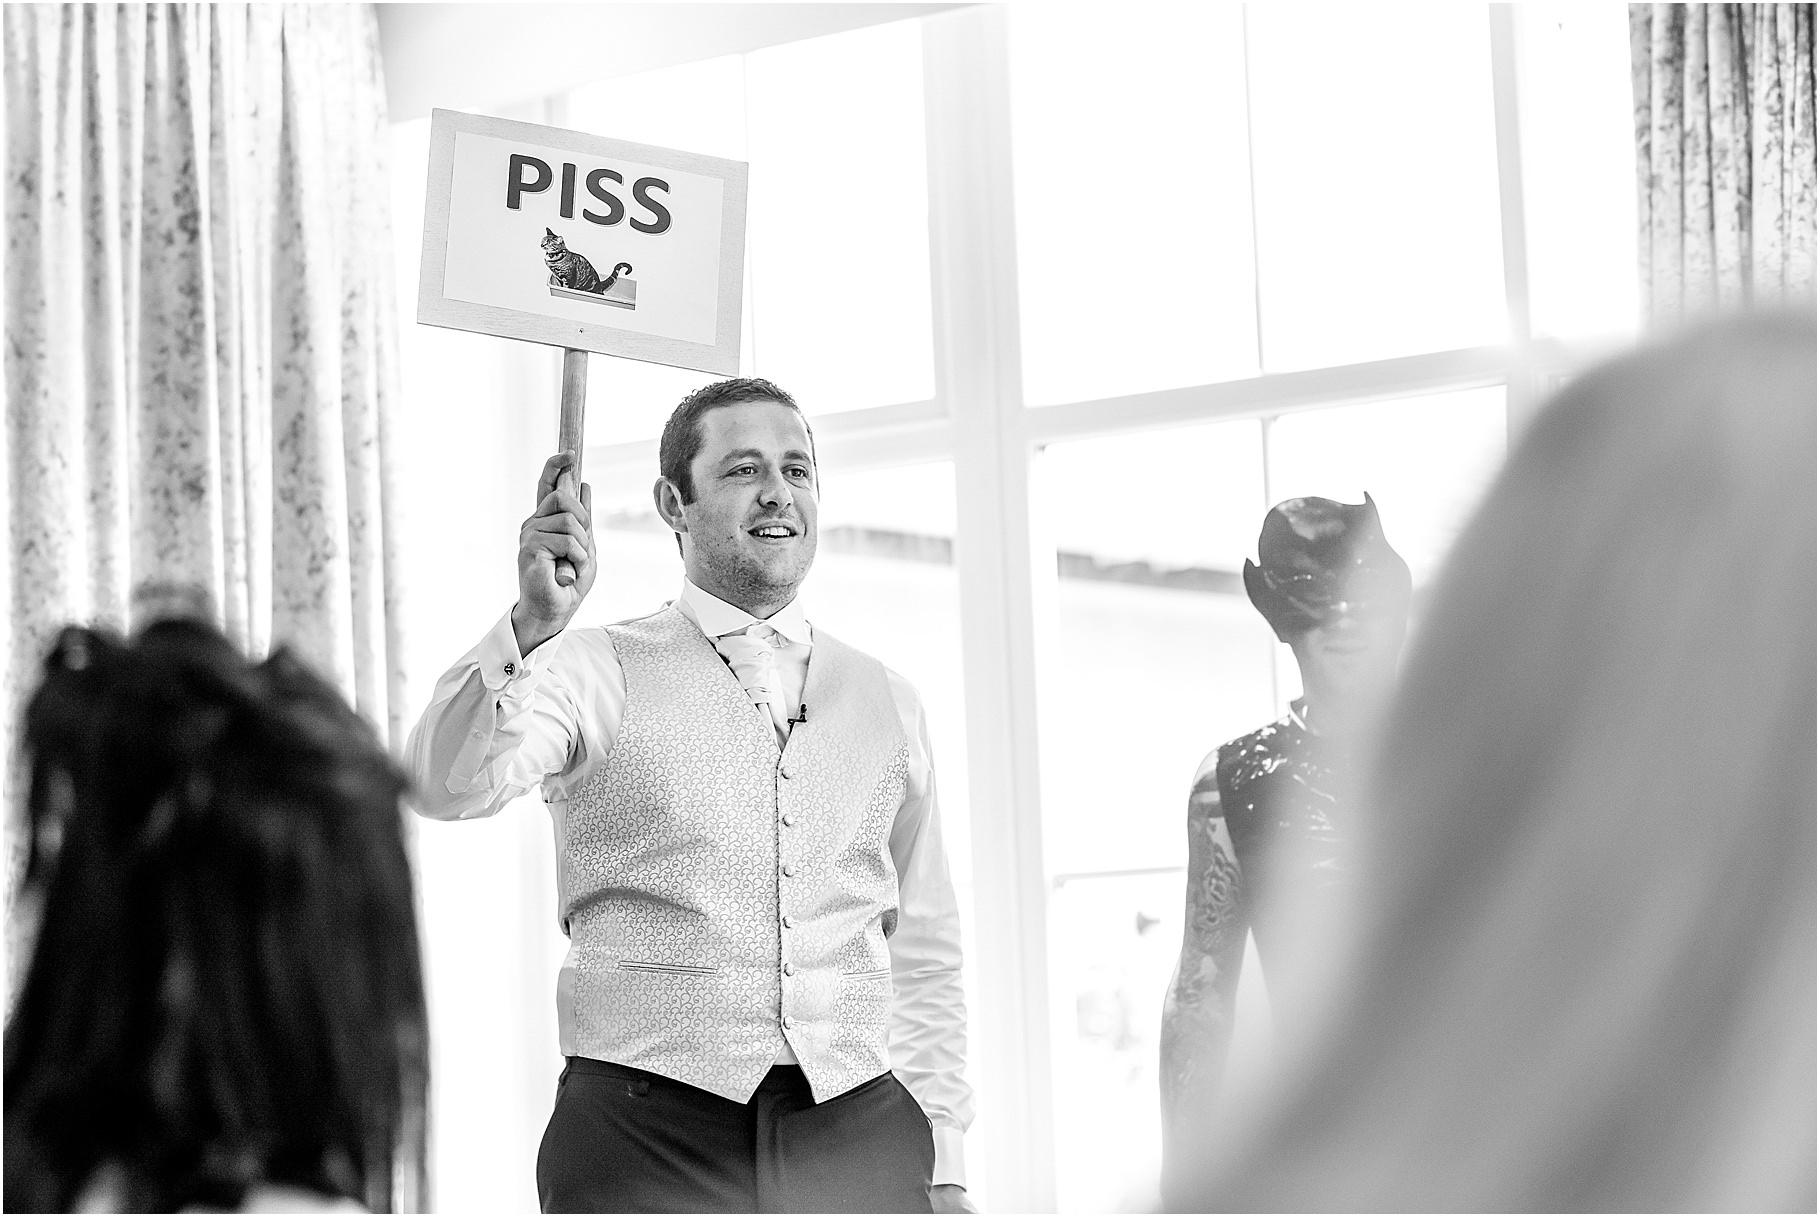 dan-wootton-photography-2017-weddings-101.jpg